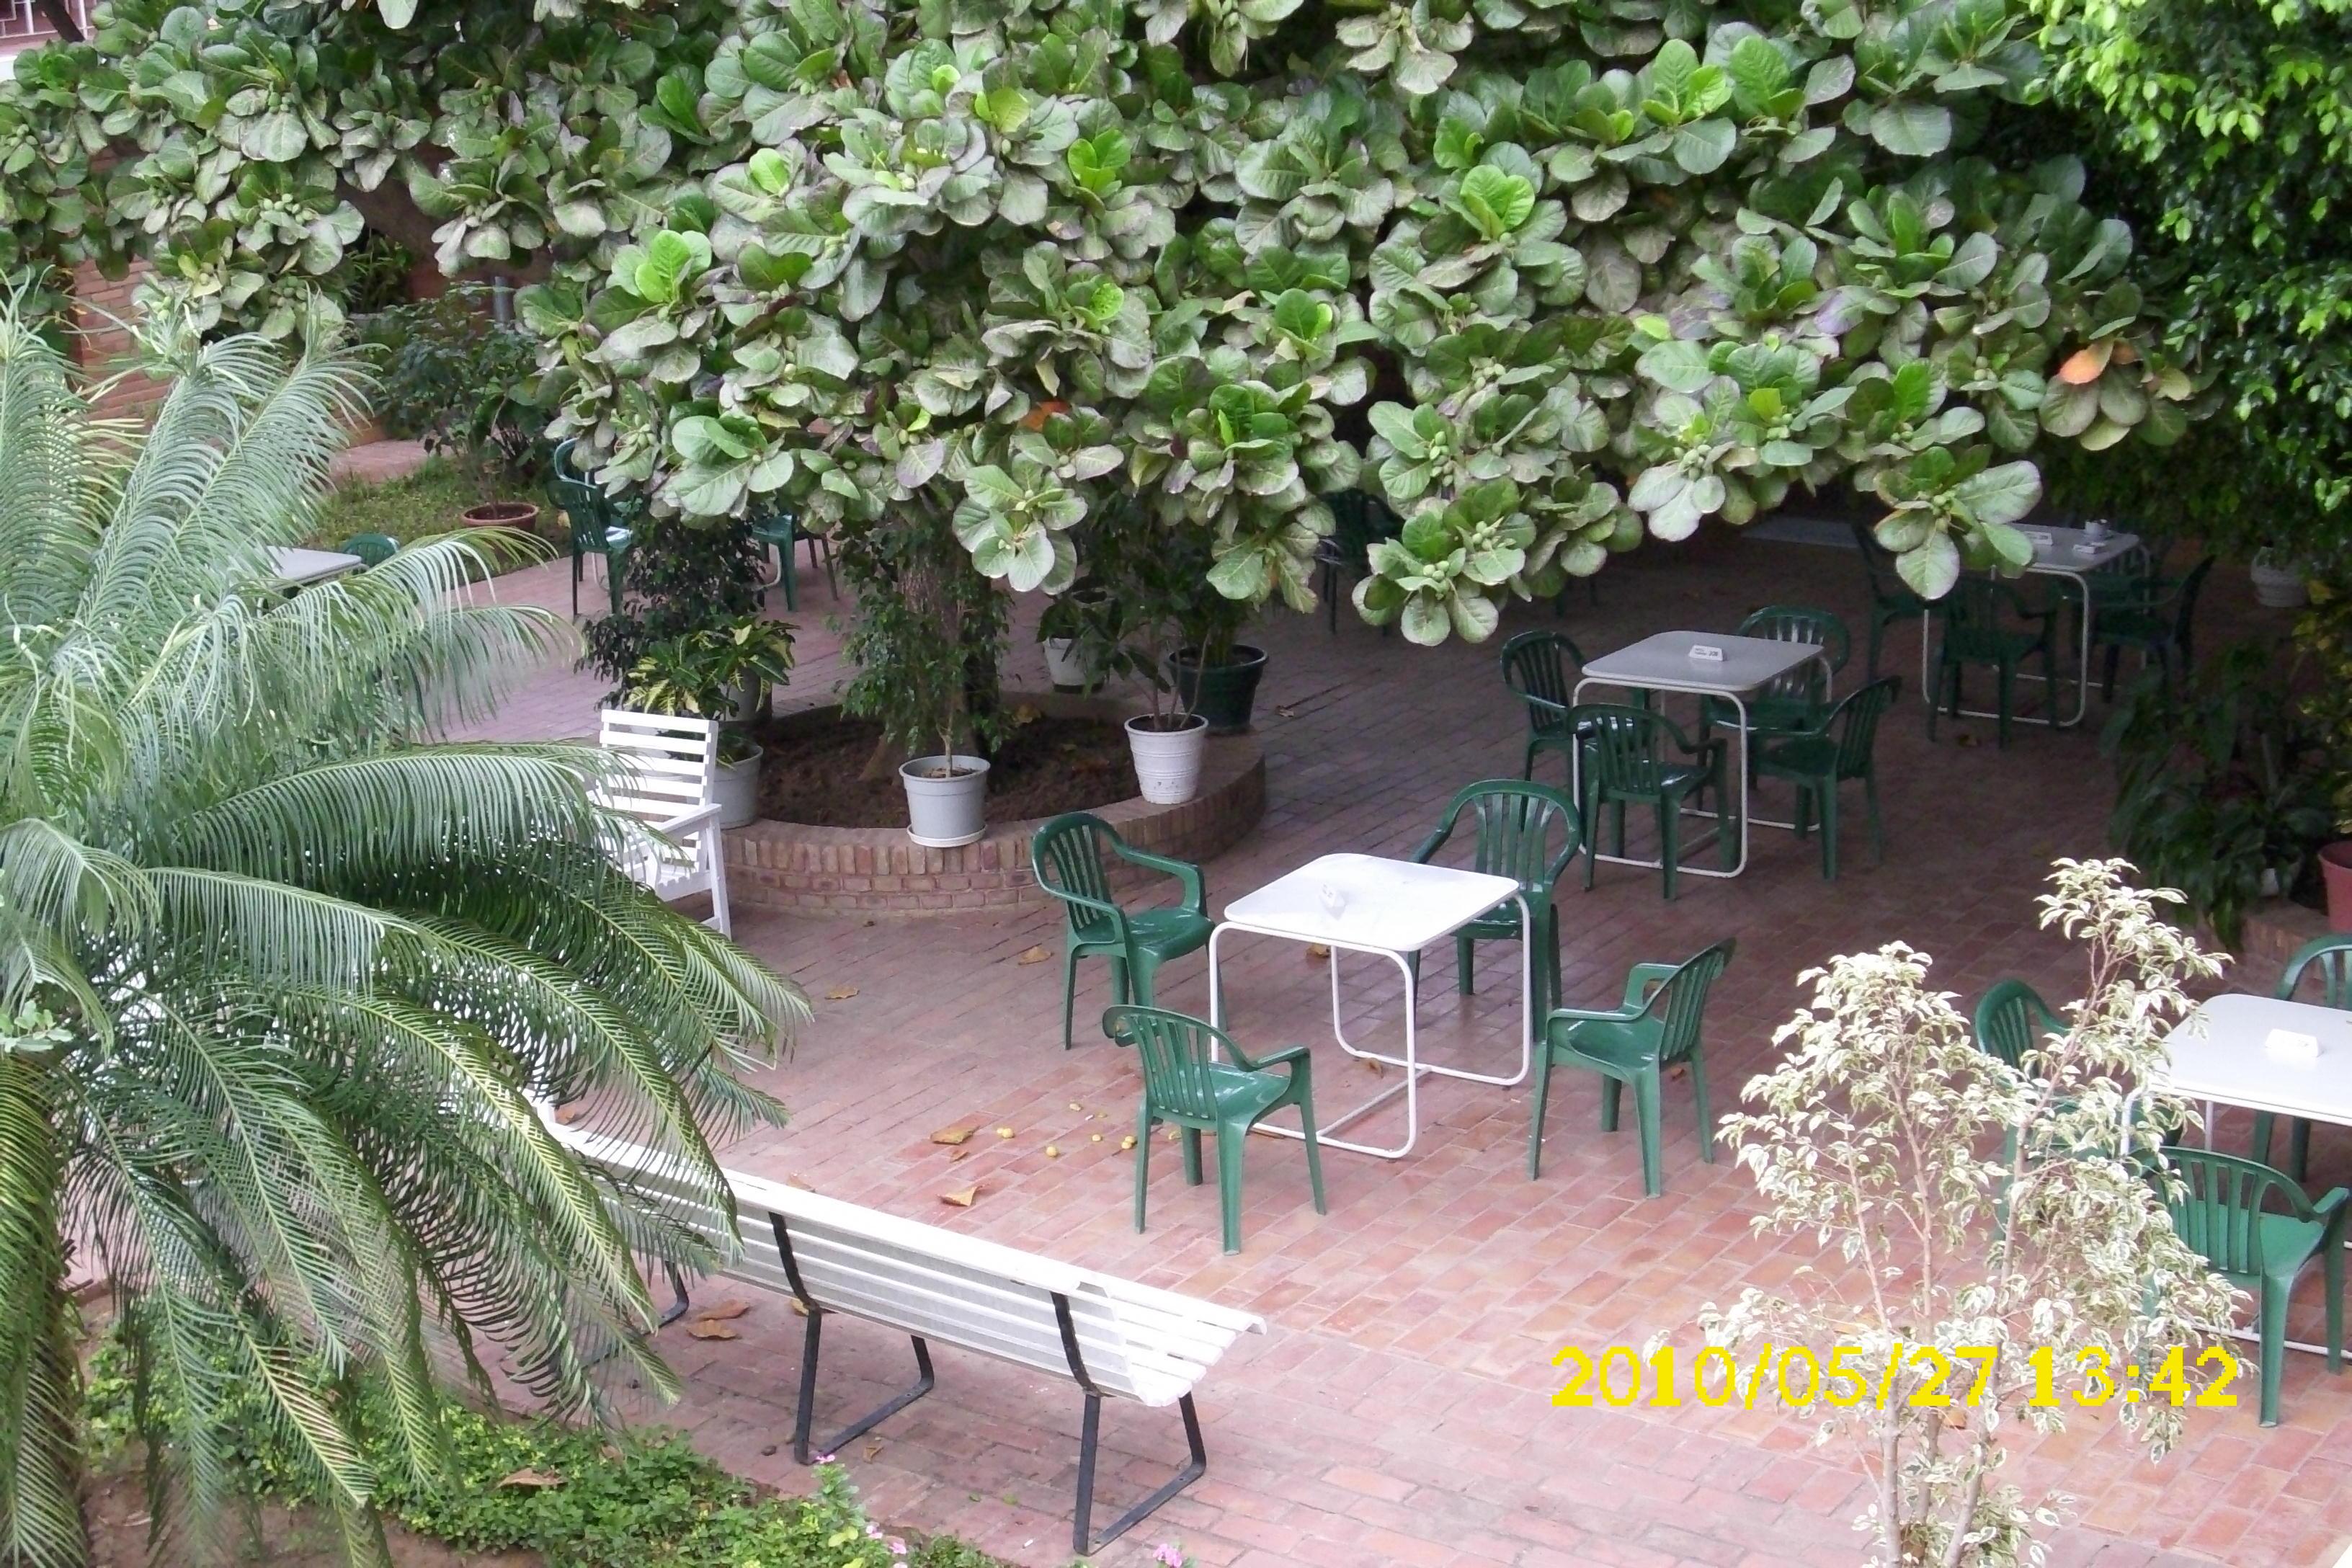 Hotel Florida Chaco Paraguay